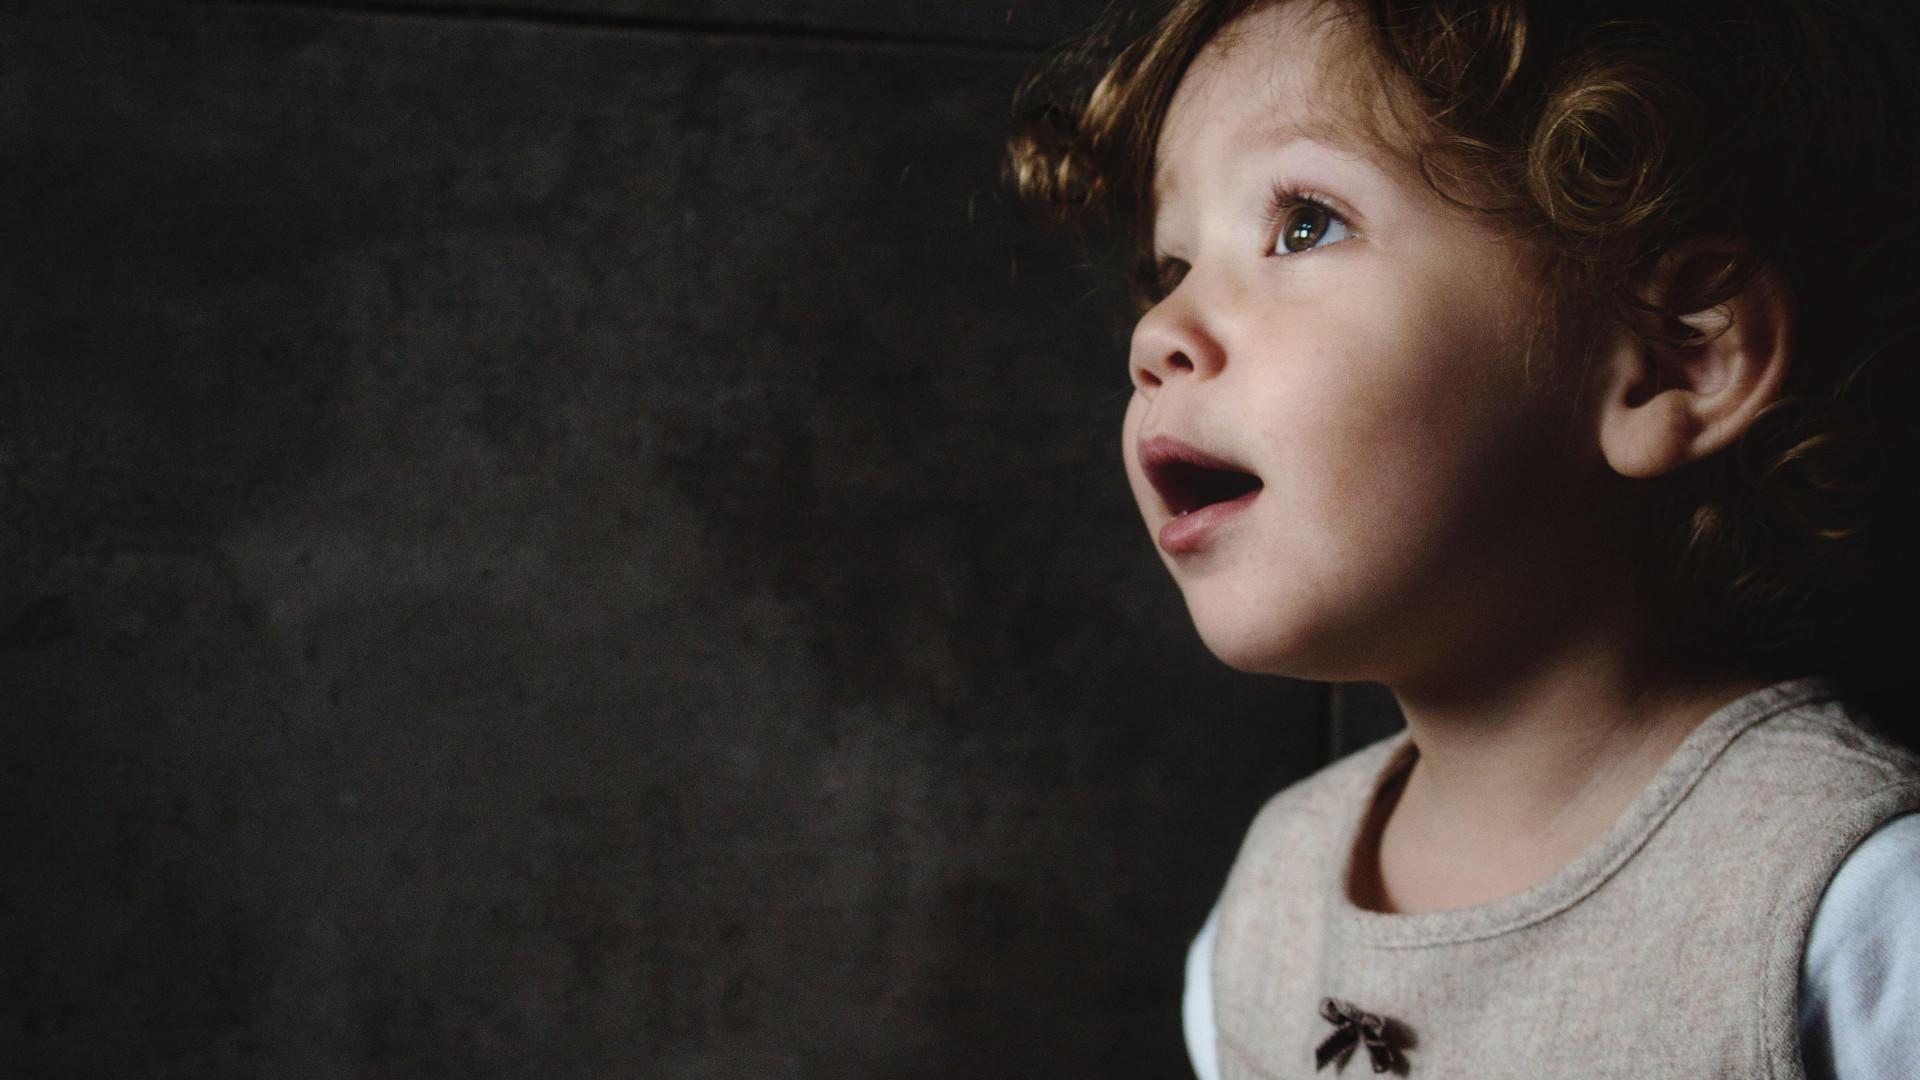 La Sclerosi Multipla in età pediatrica